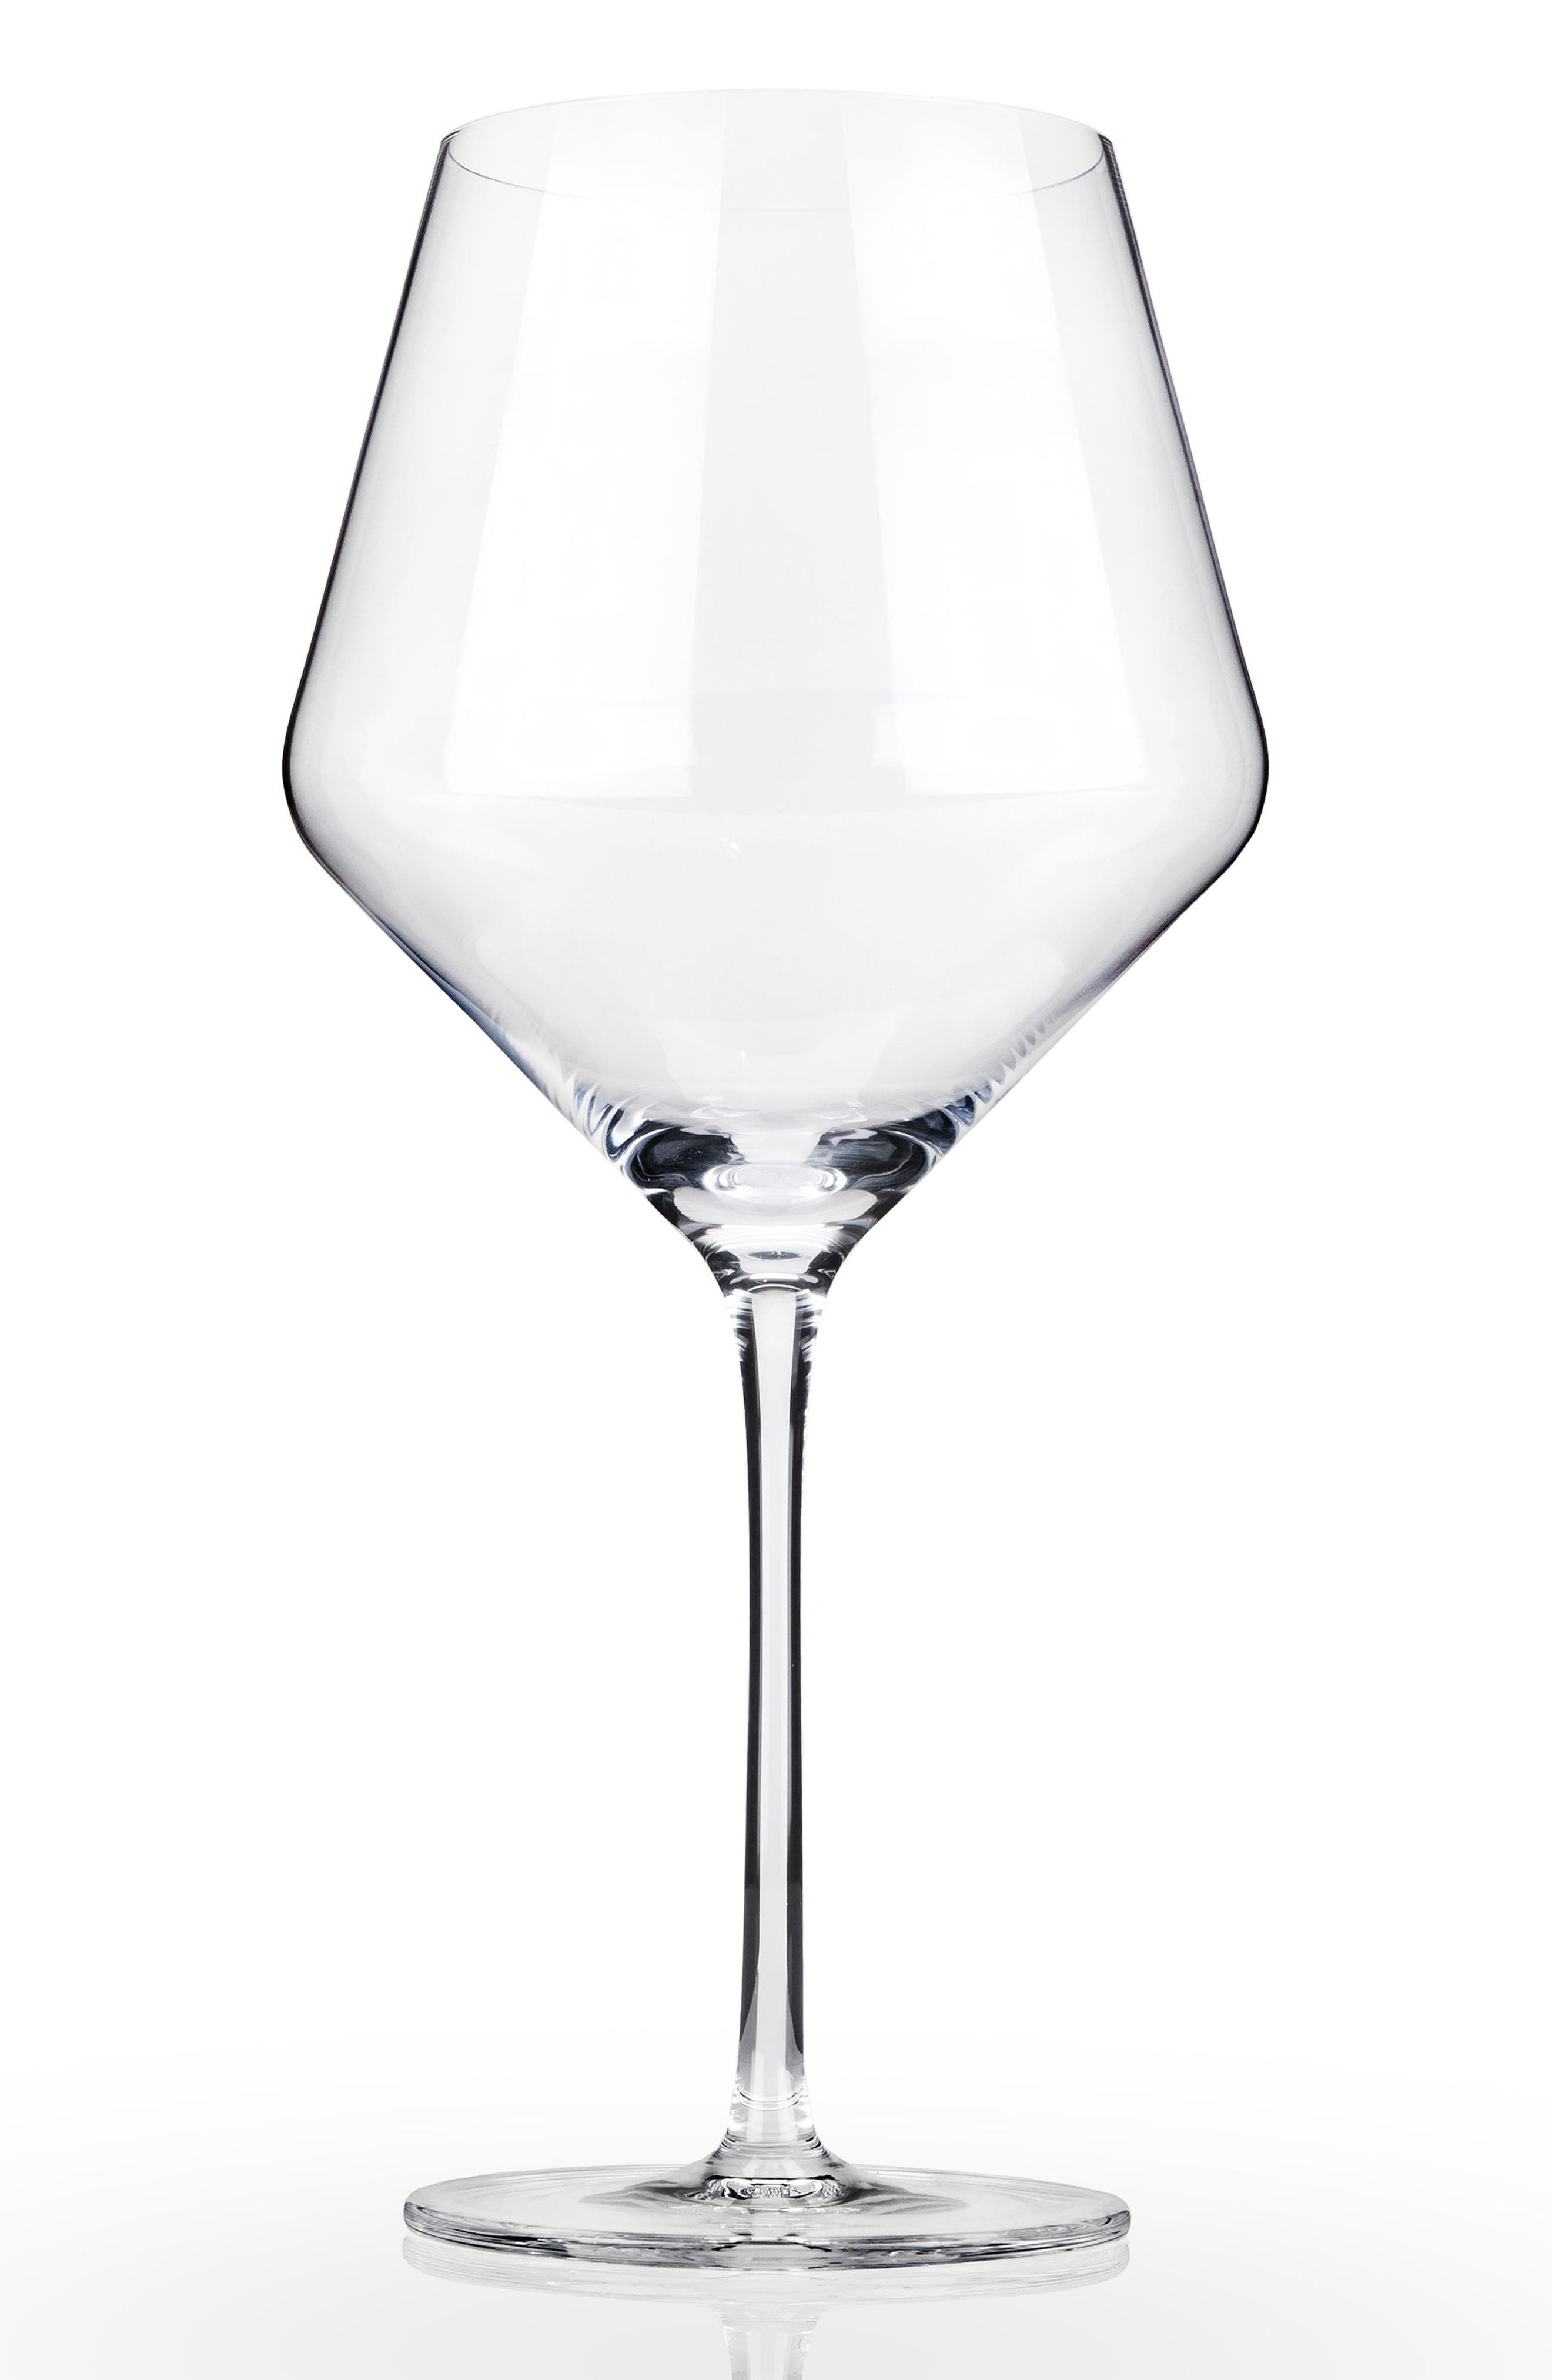 Raye Set of 2 Burgundy Glasses,                         Main,                         color, Clear